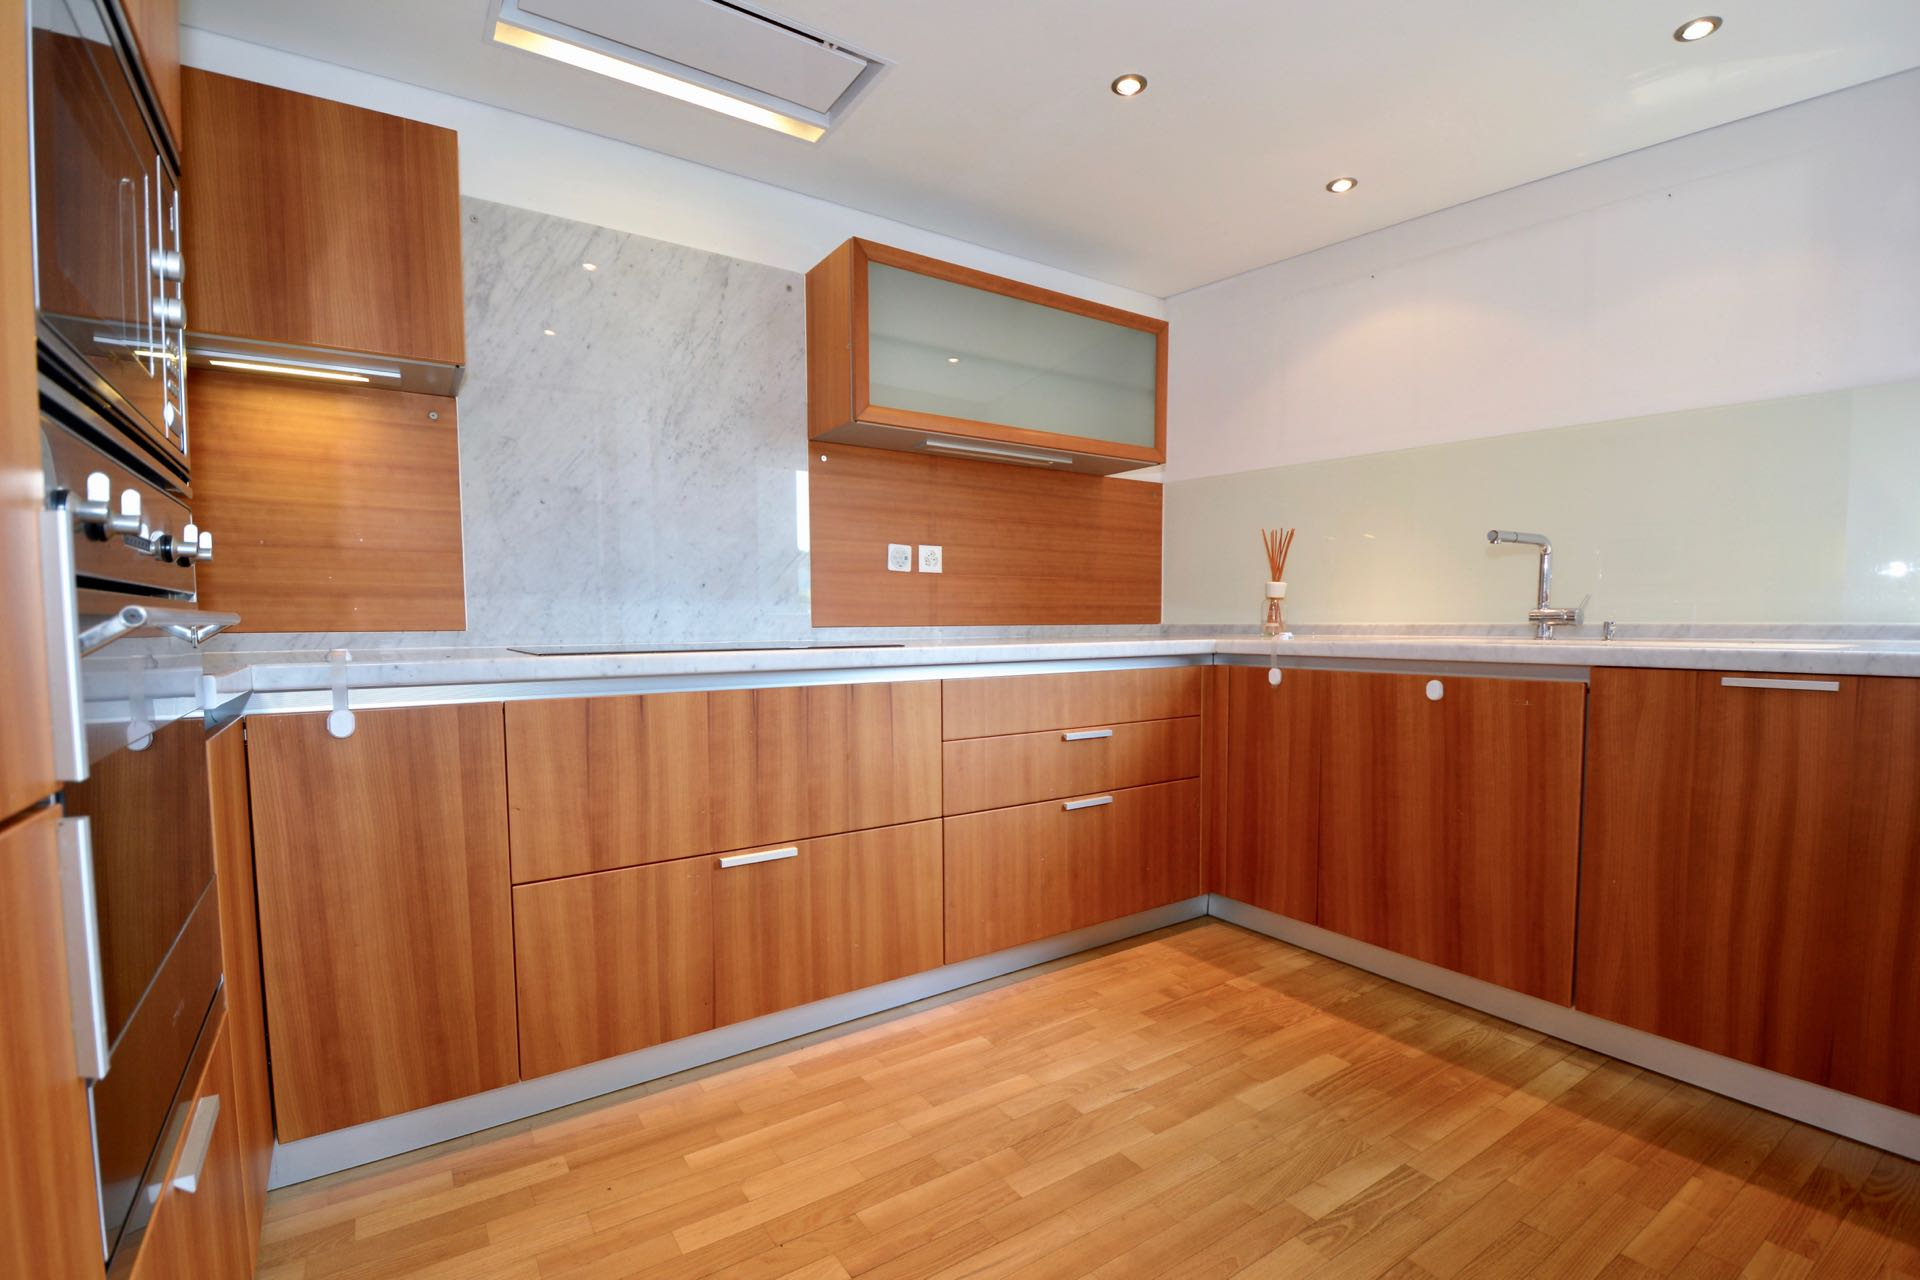 Cucina moderna costruita con colori caldi